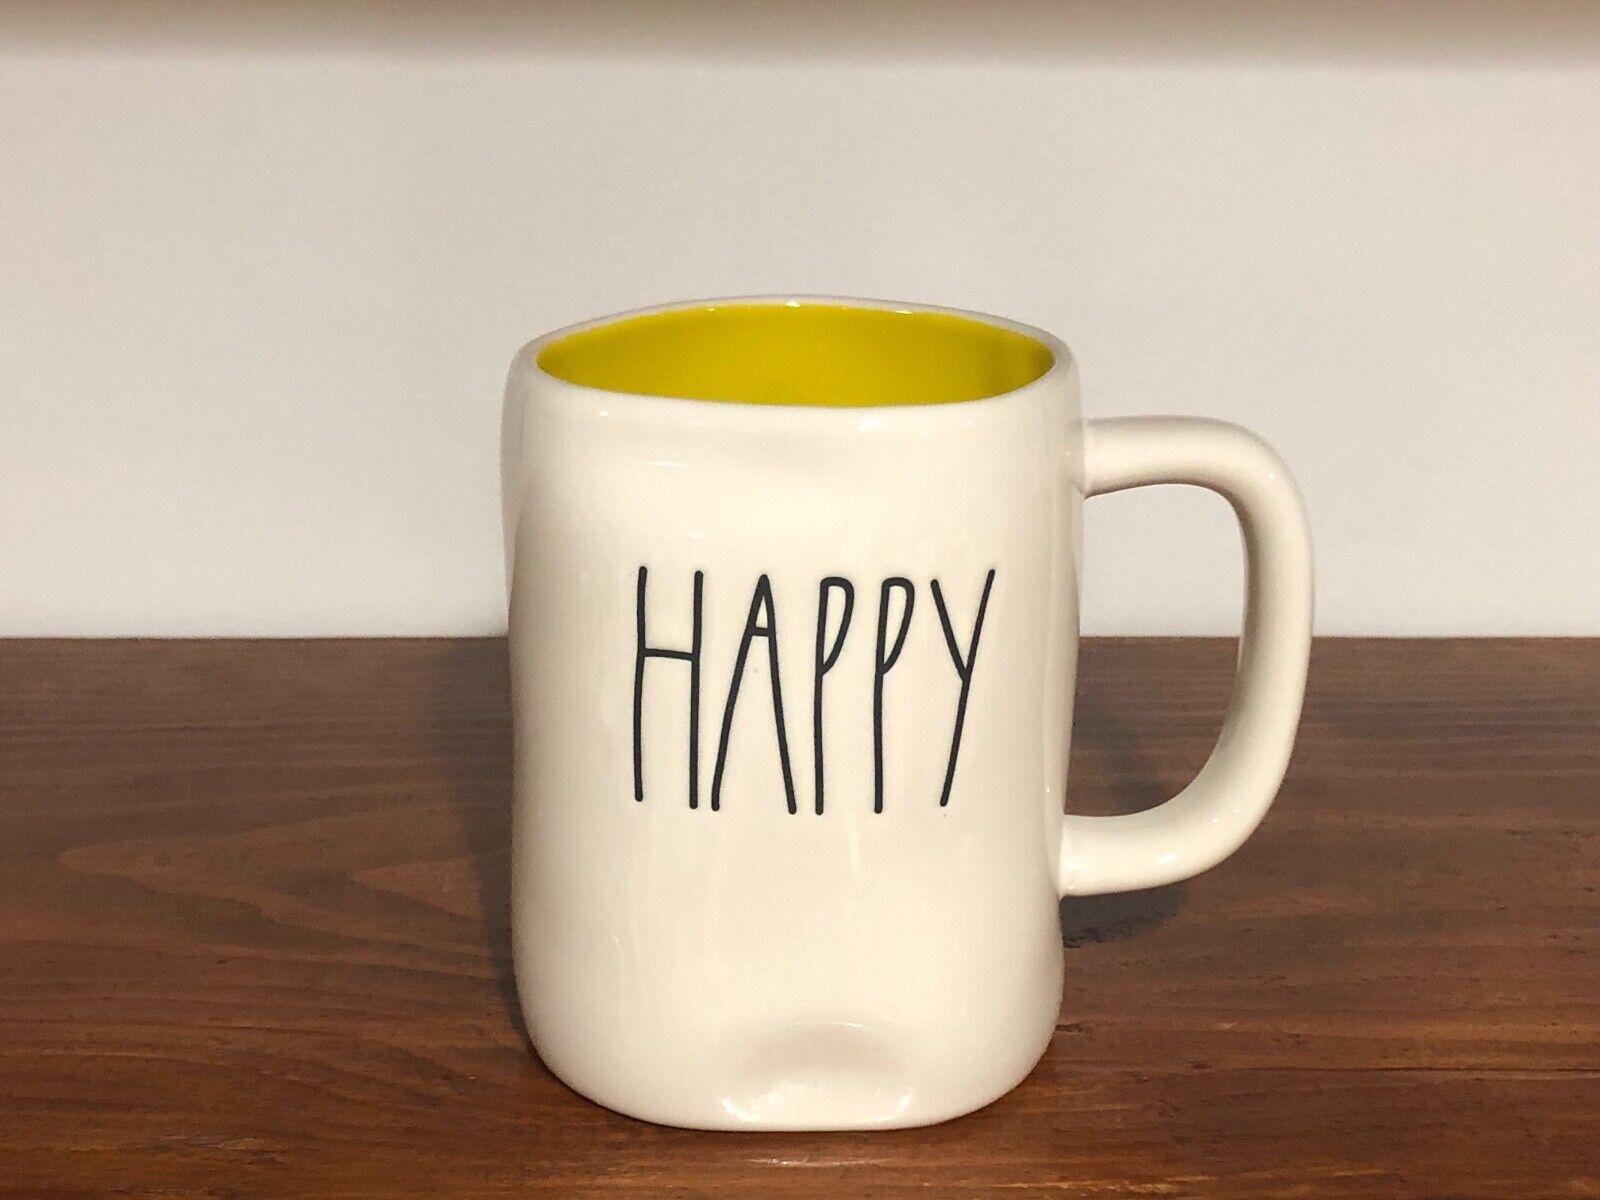 Rae Dunn Artisan Collection By Magenta Farmhouse LL Large Letter Coffee Tea Mug HAPPY (YELLOW)